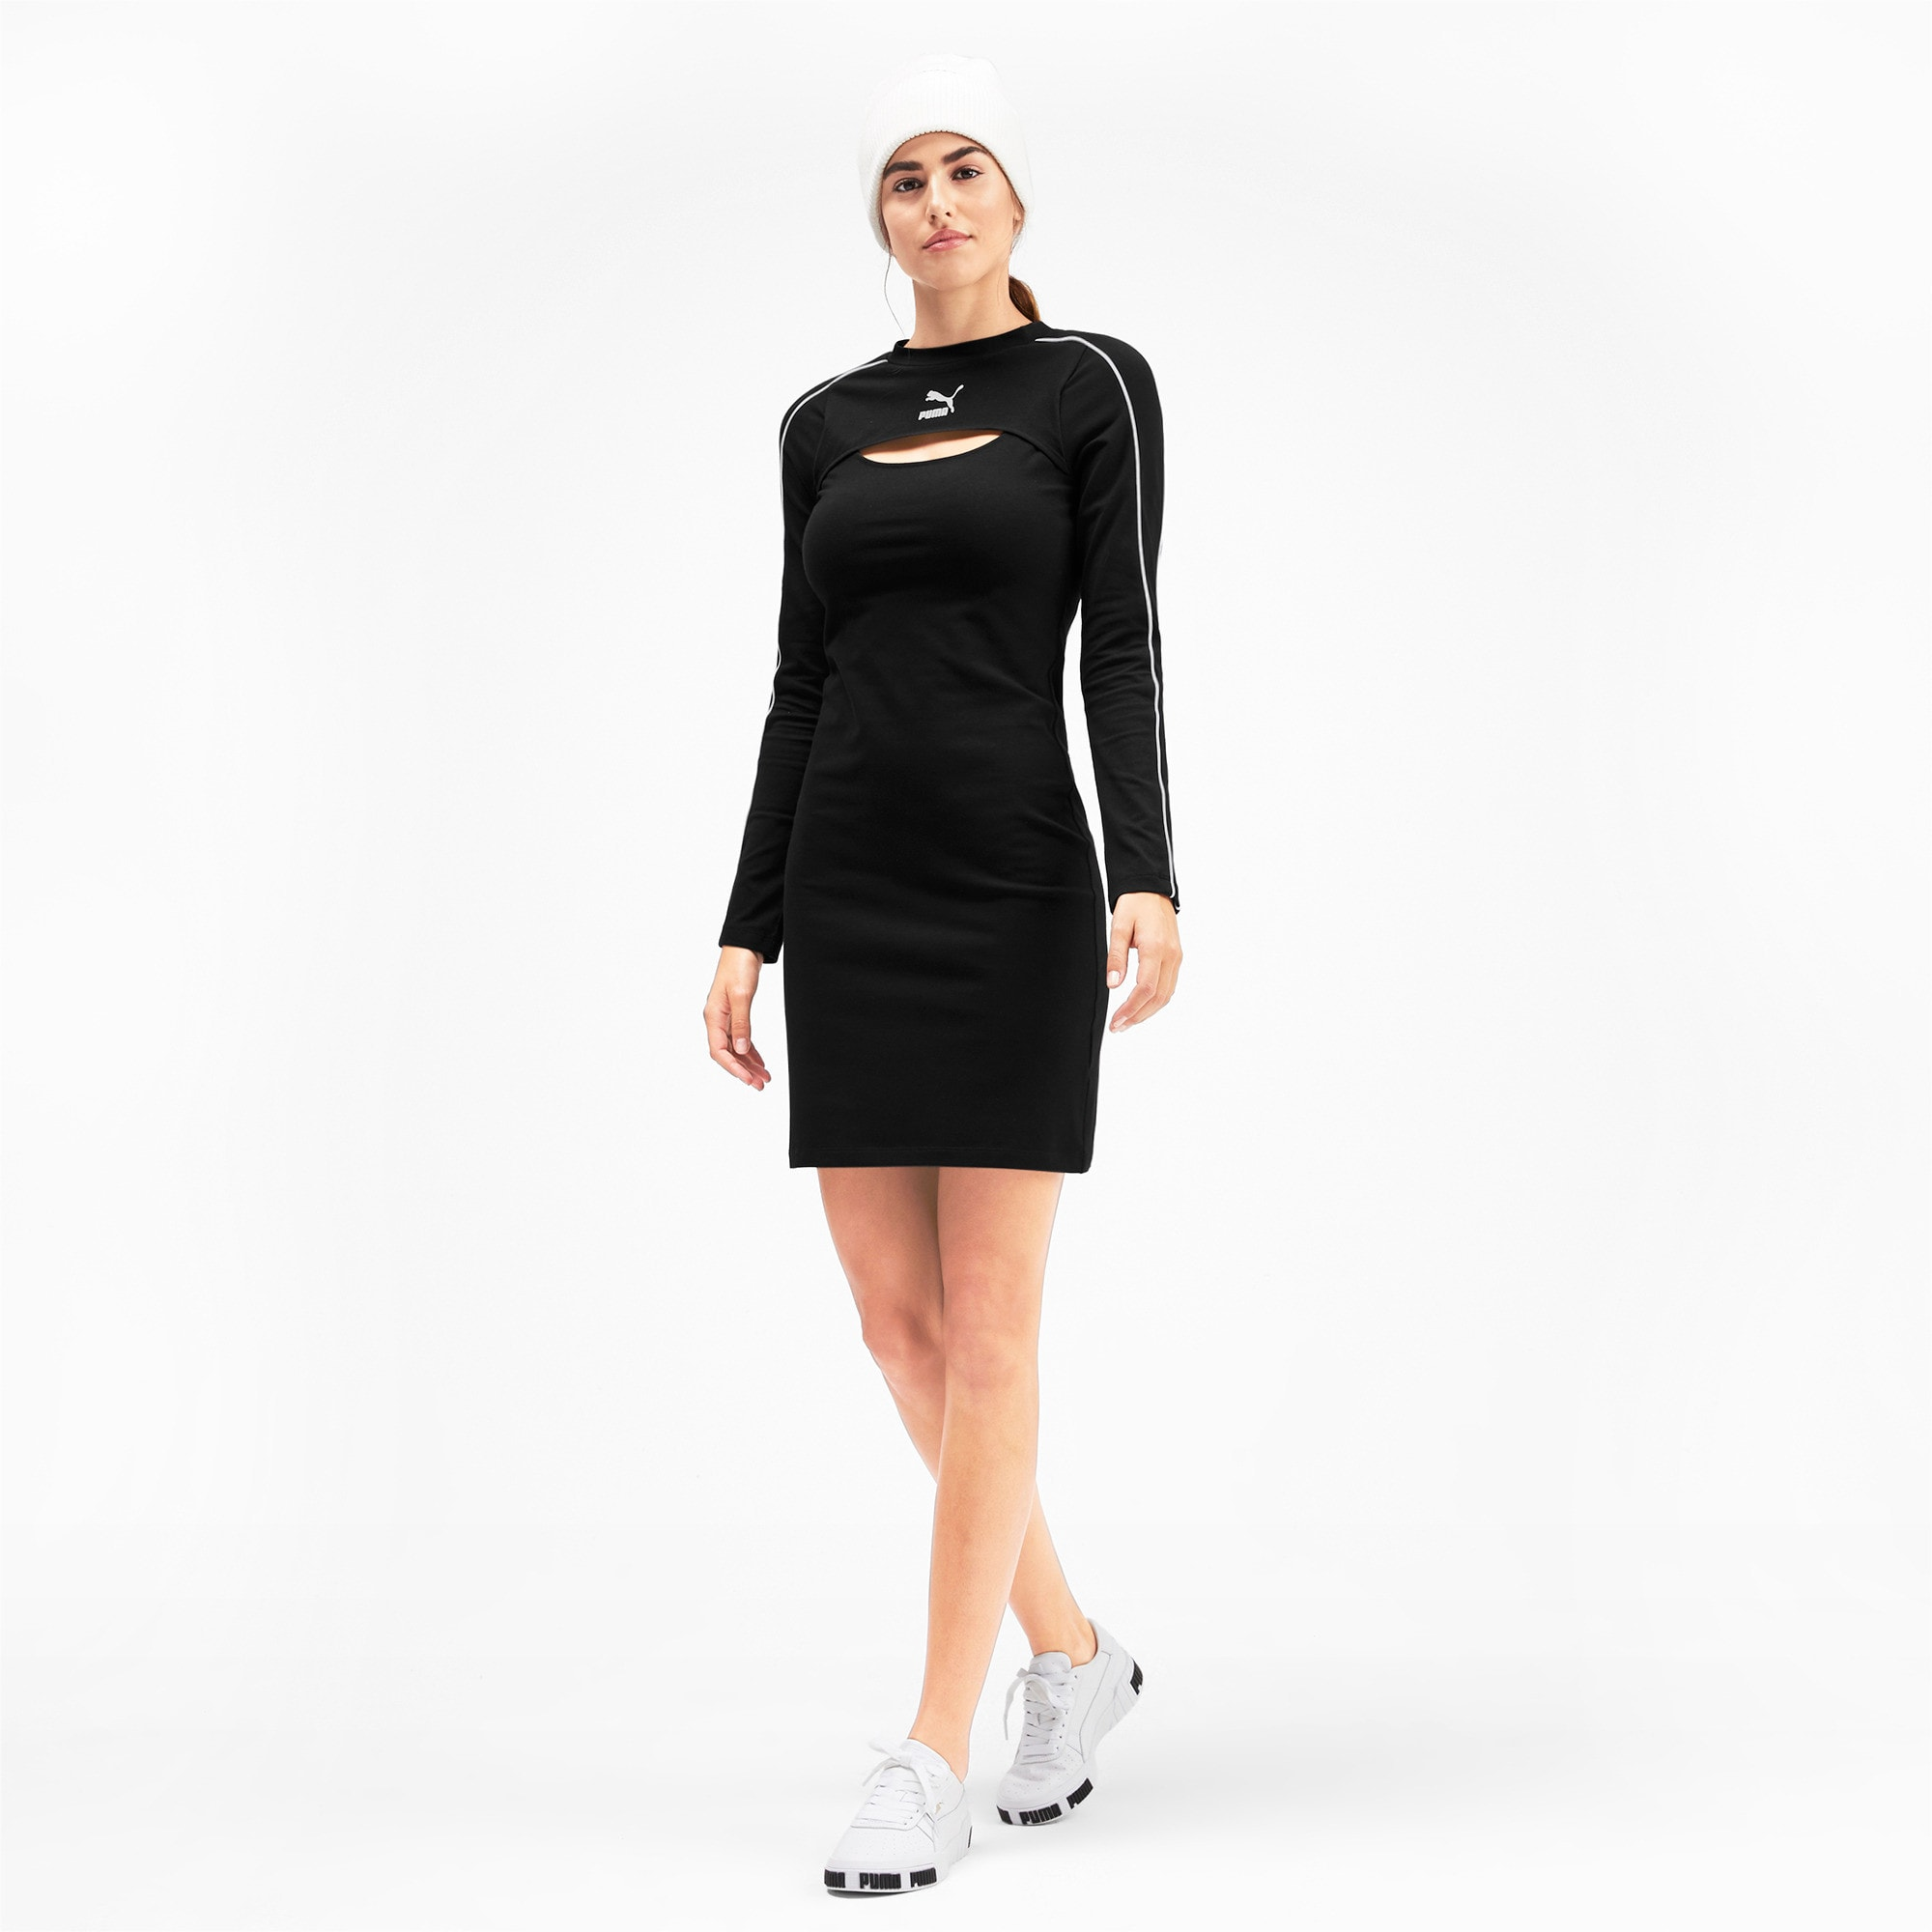 Thumbnail 3 of Classics Women's Dress, Puma Black, medium